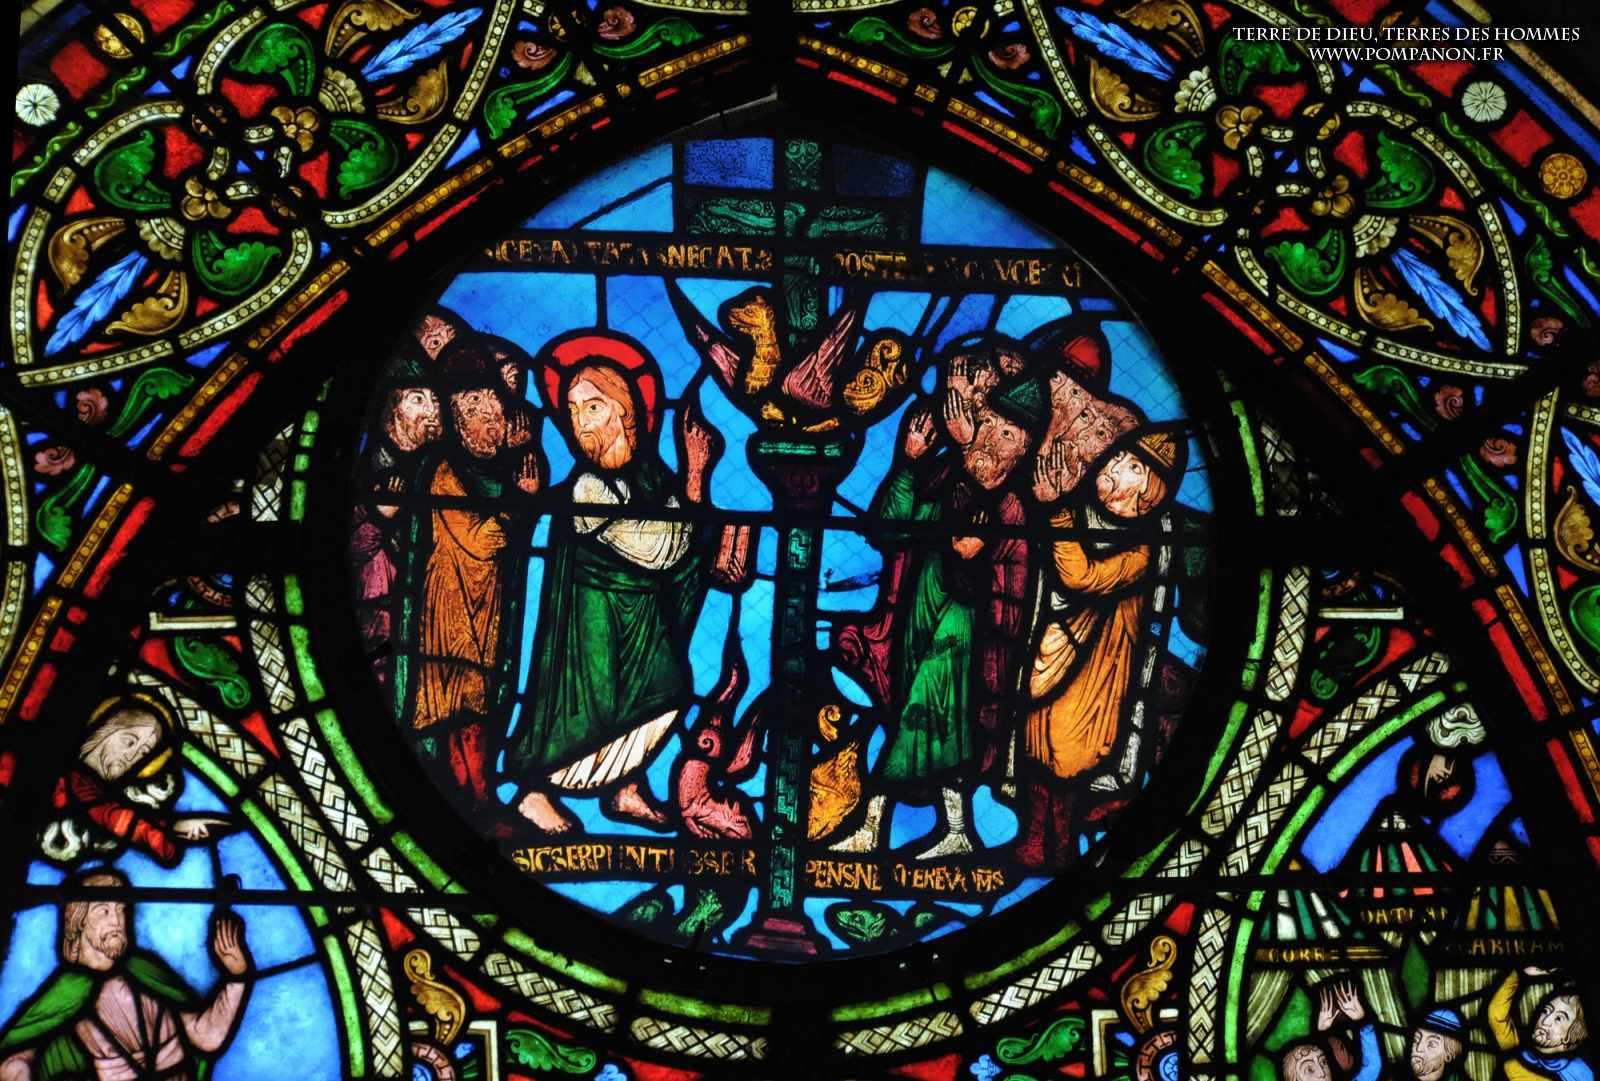 Les vitraux  du XIIIéme siècle . 5043eefcbf001